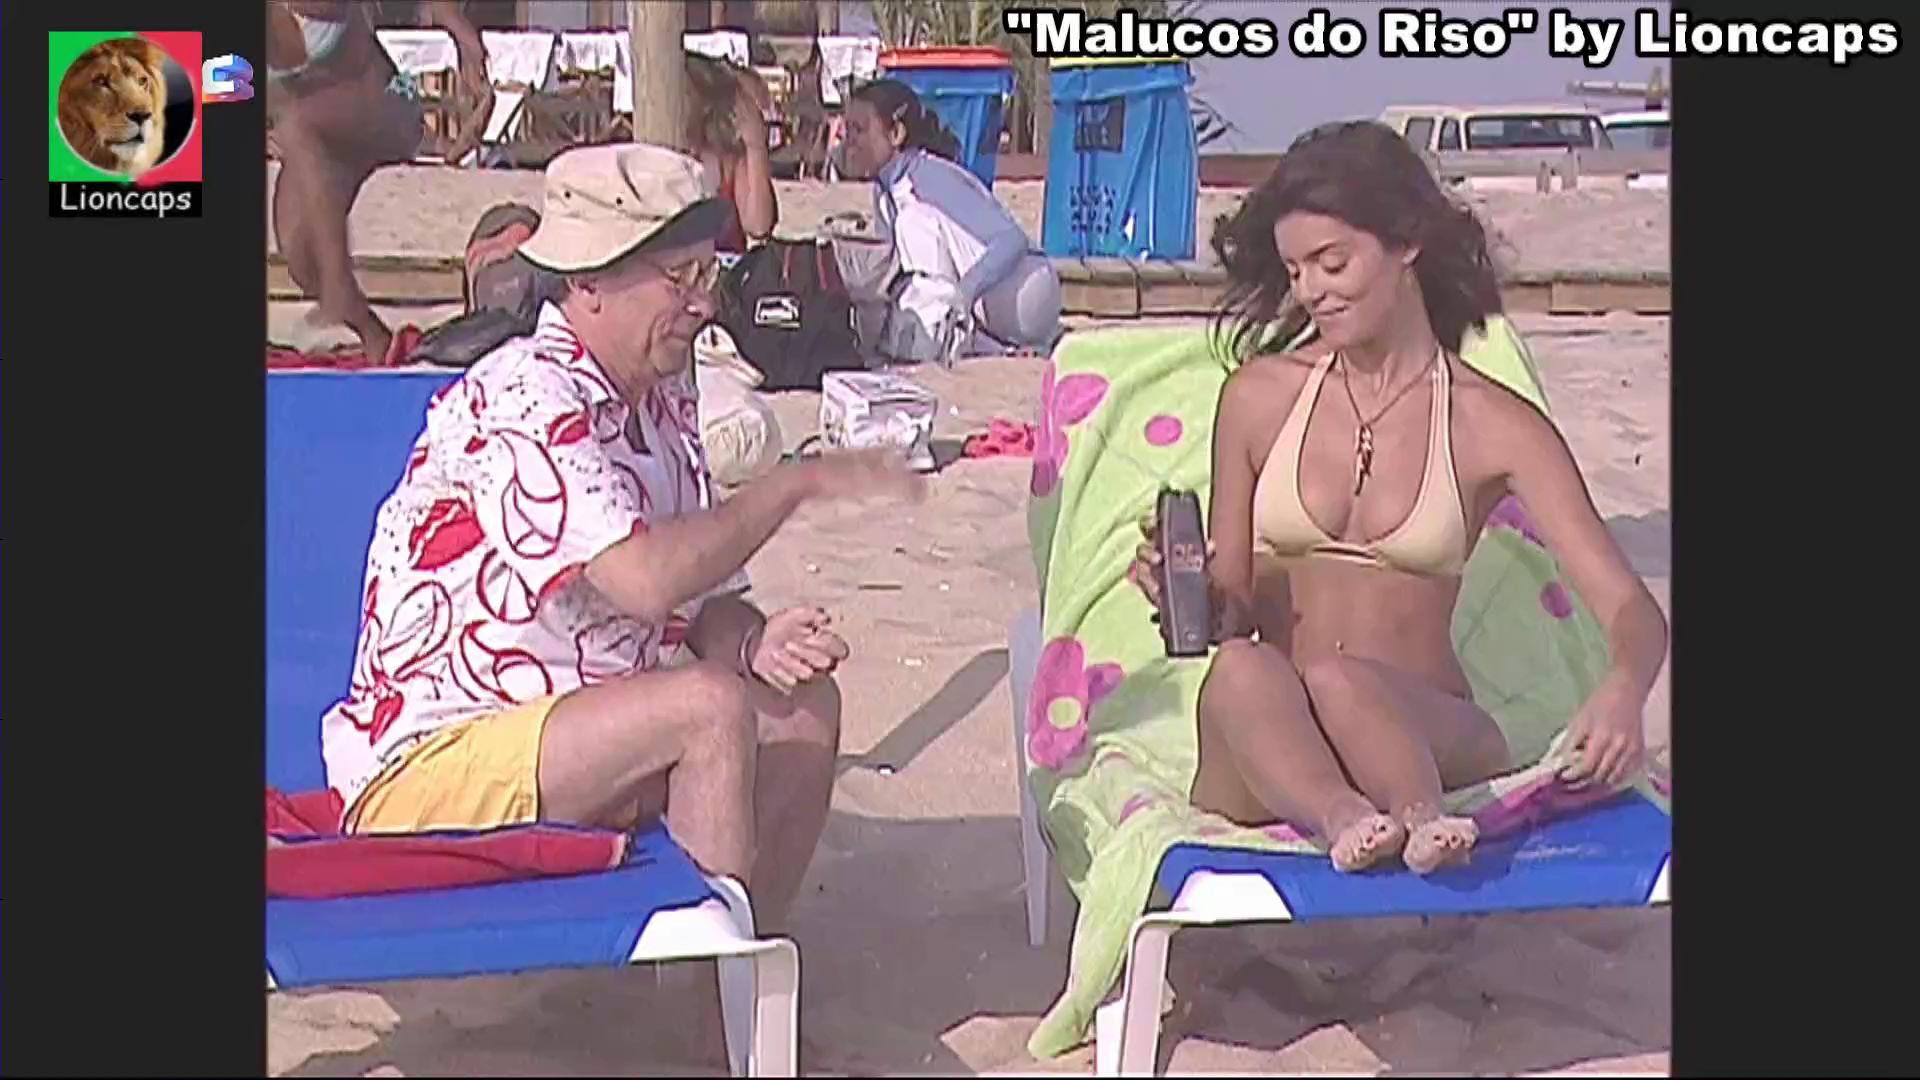 475061142_malucos_riso_alda_gomes_vs190malucos_riso_602_1507_122_15lo.JPG